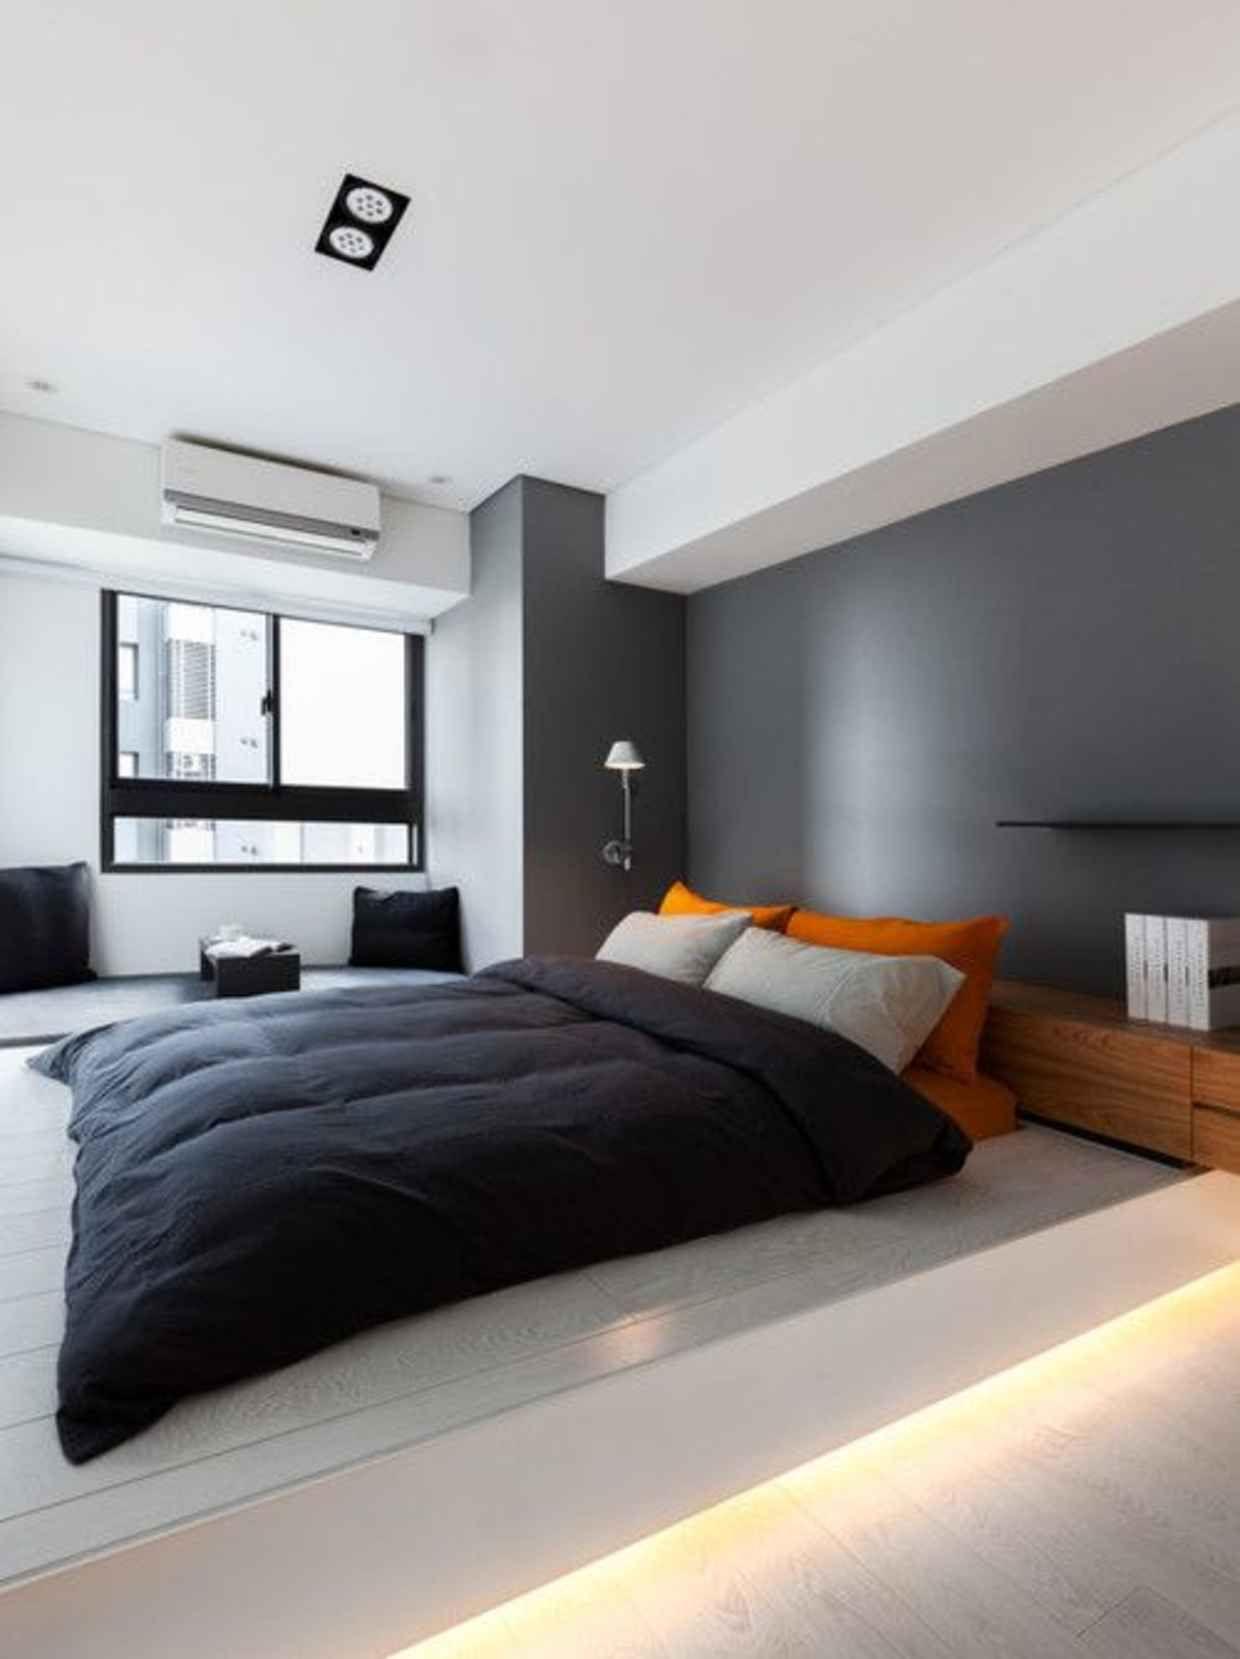 50 Perfectly Minimal And Inspiring Bedrooms Apartment Bedroom Decor Apartment Bedroom Design Modern Minimalist Bedroom